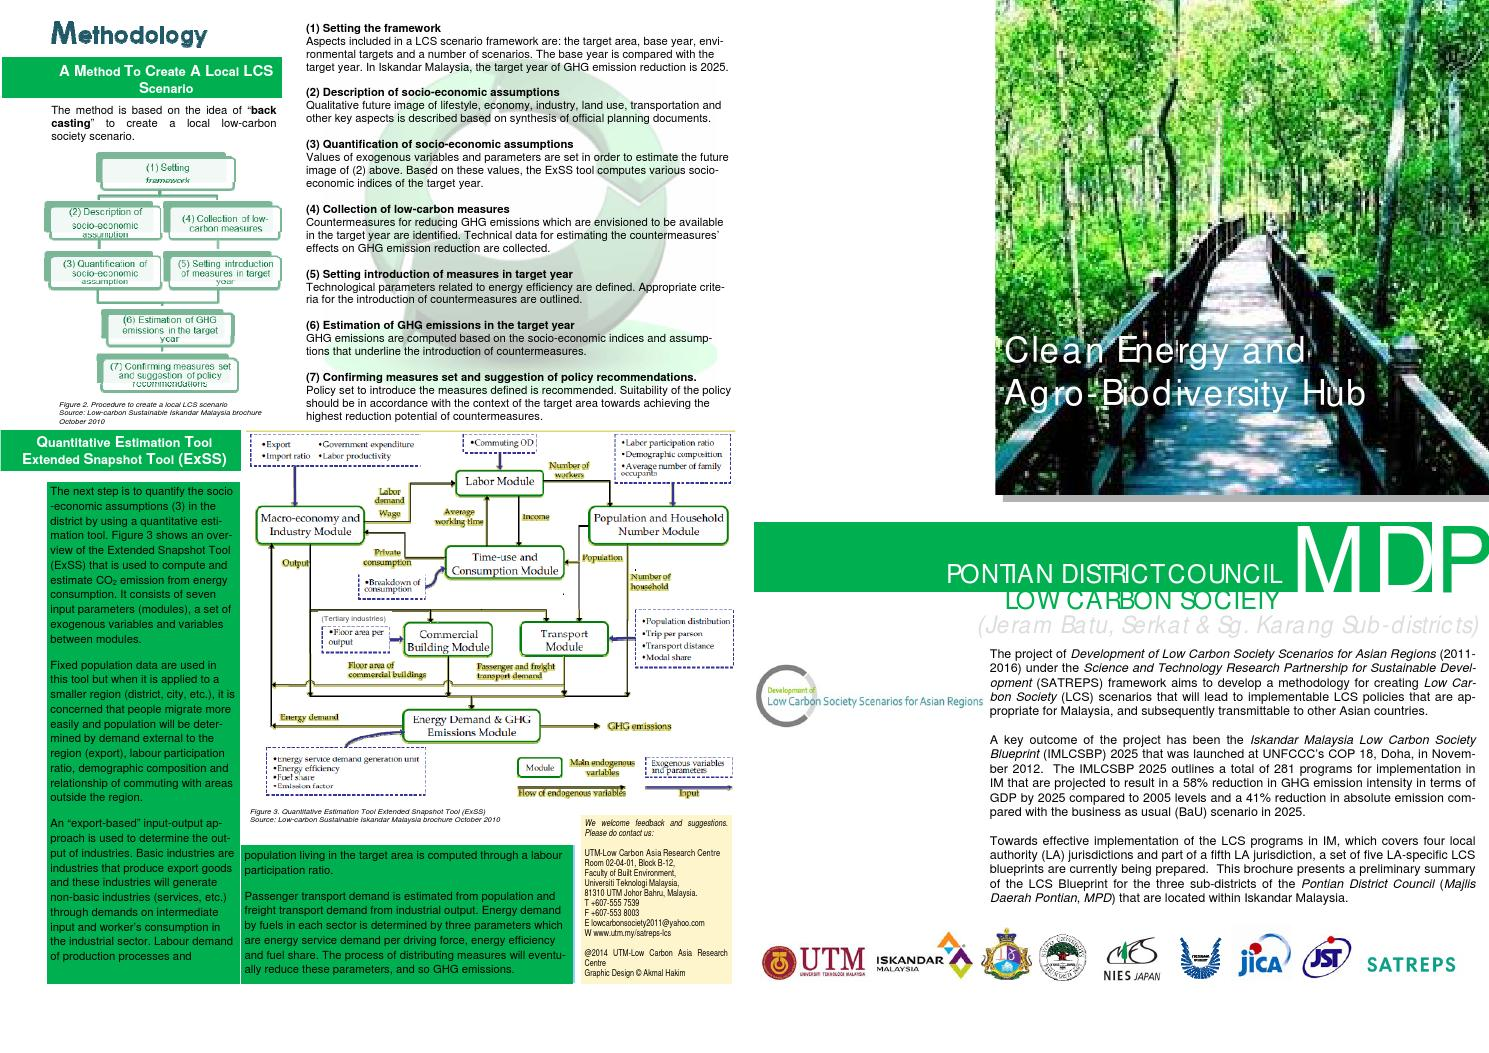 Pontian district council mdp by universiti teknologi malaysia issuu malvernweather Gallery